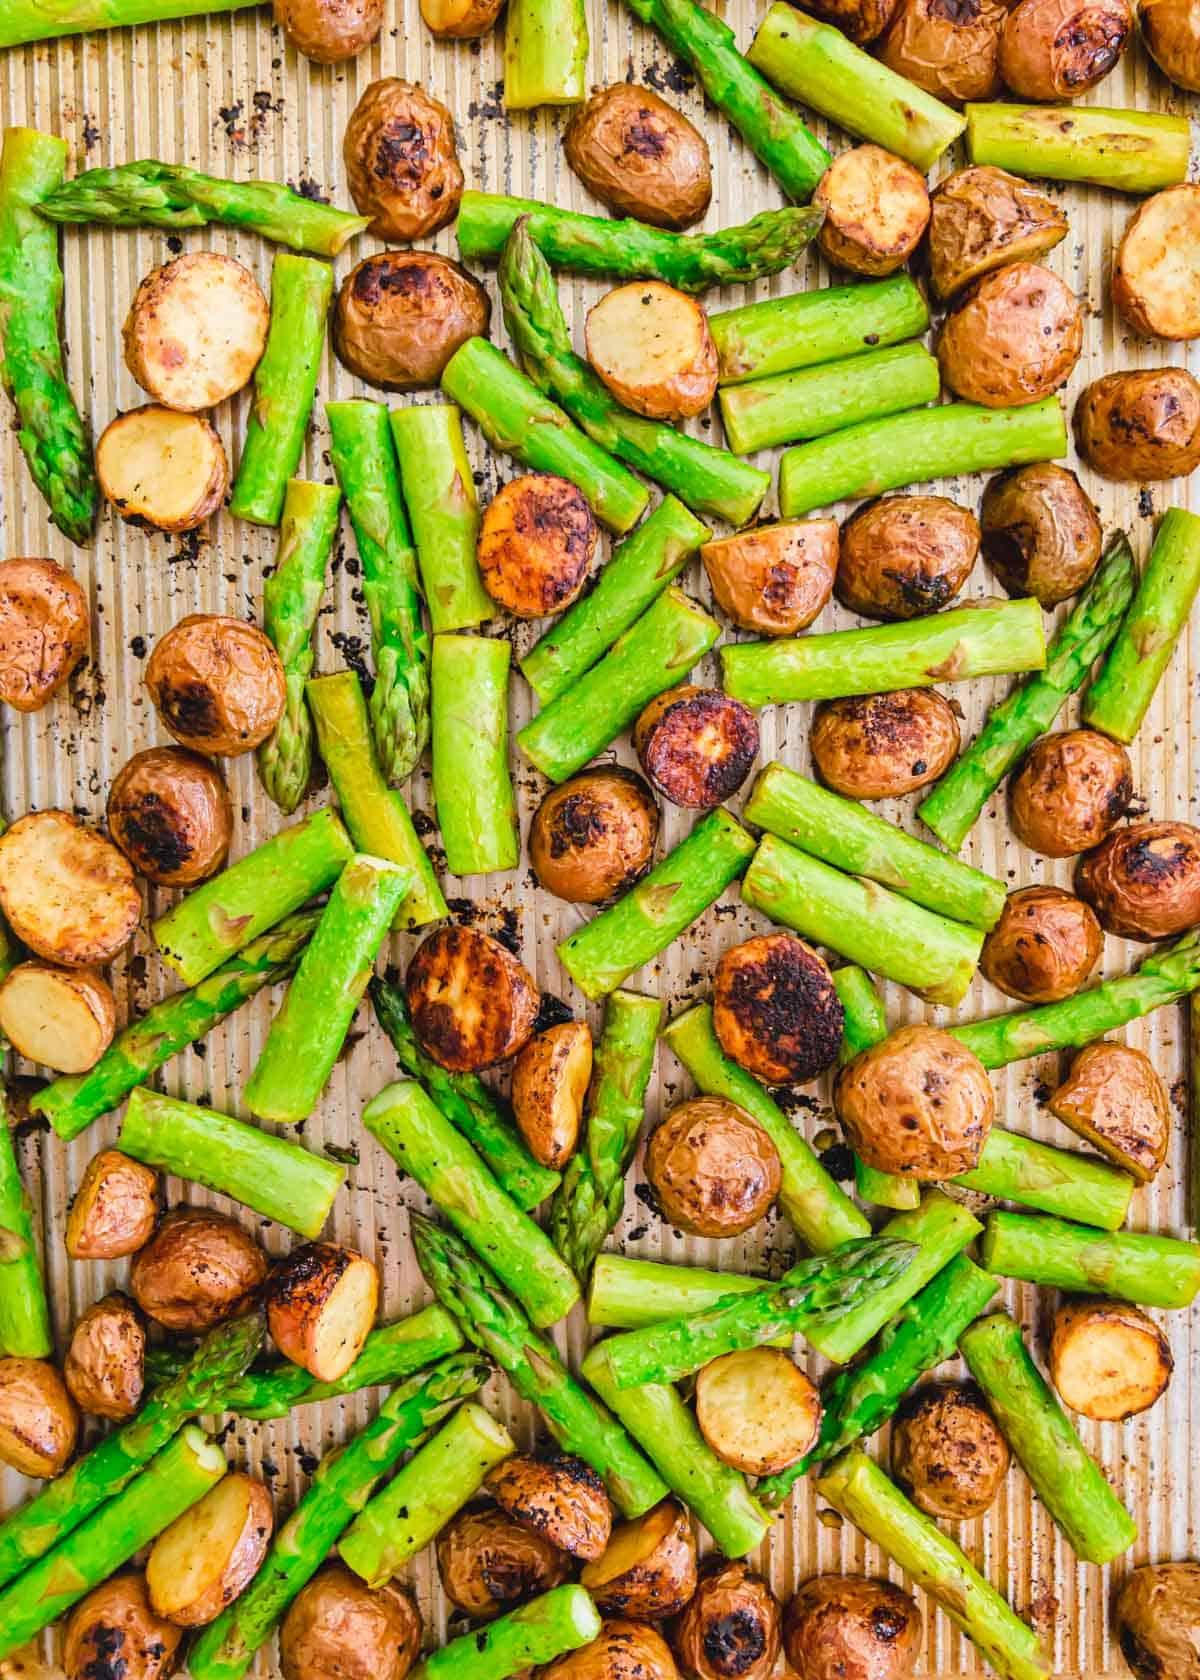 sheet pan roasted red potatoes and asparagus with balsamic and garlic seasoning.